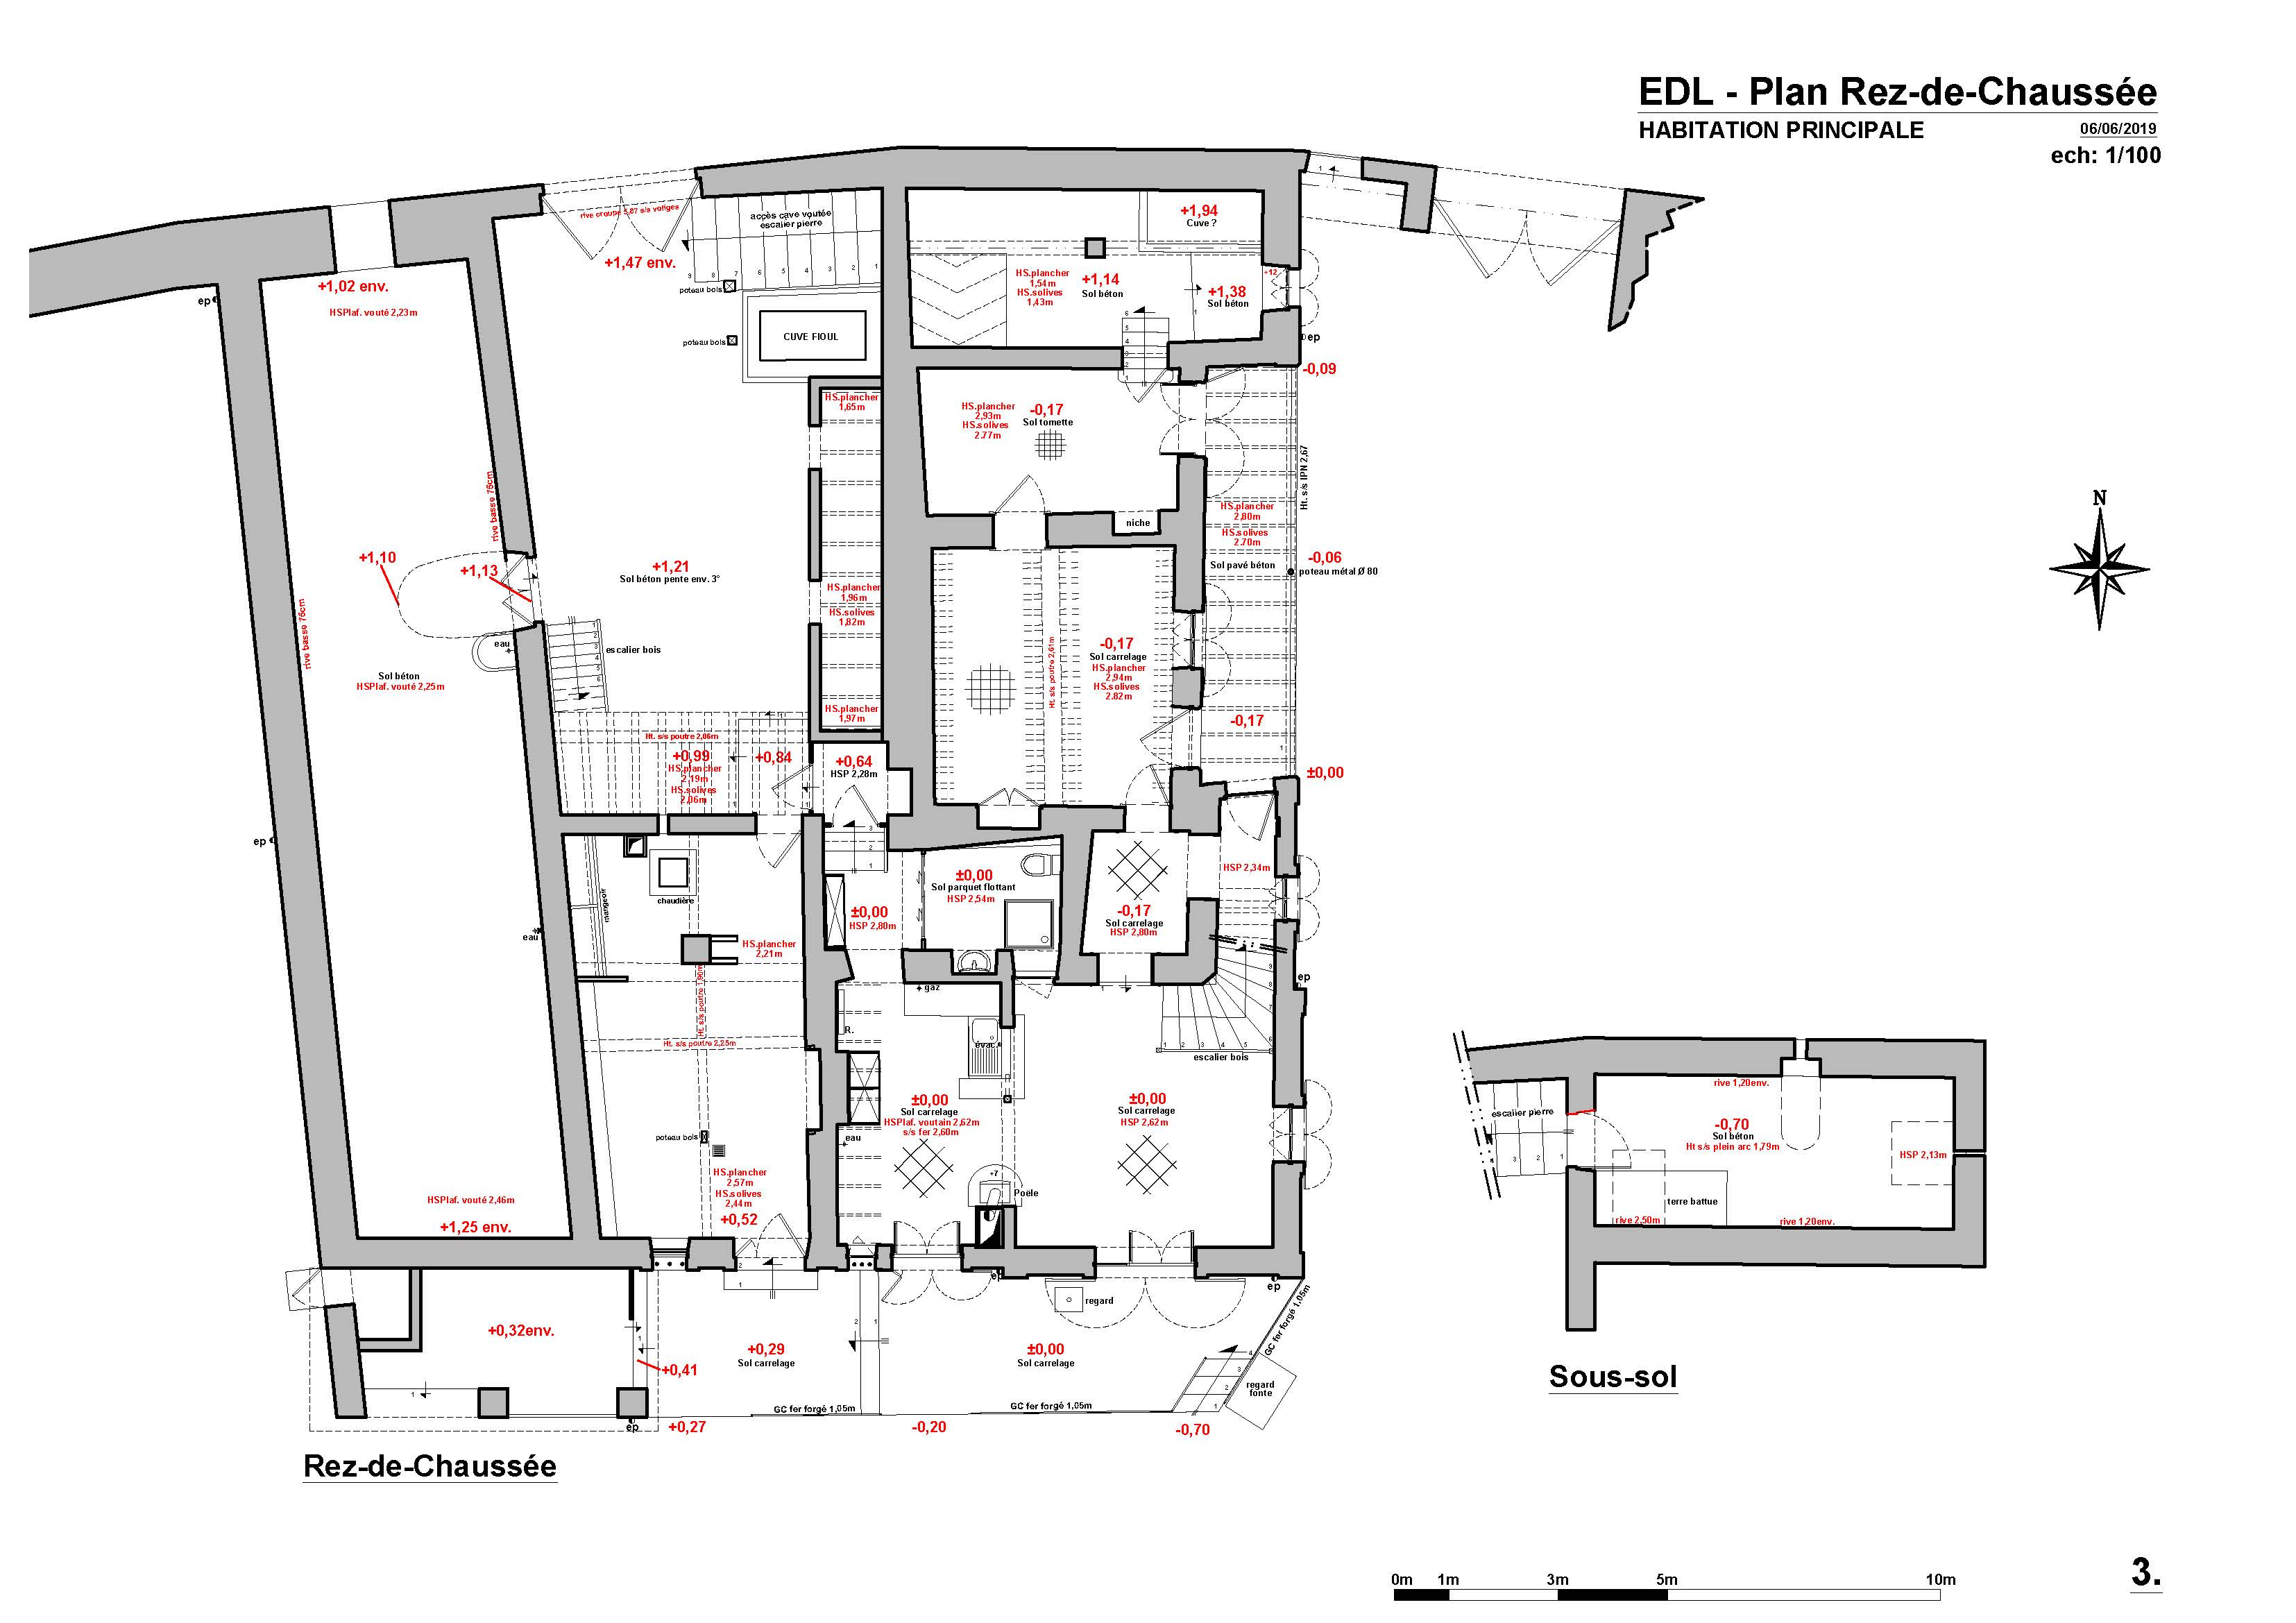 Plan Rez-de-Chausée - EDL